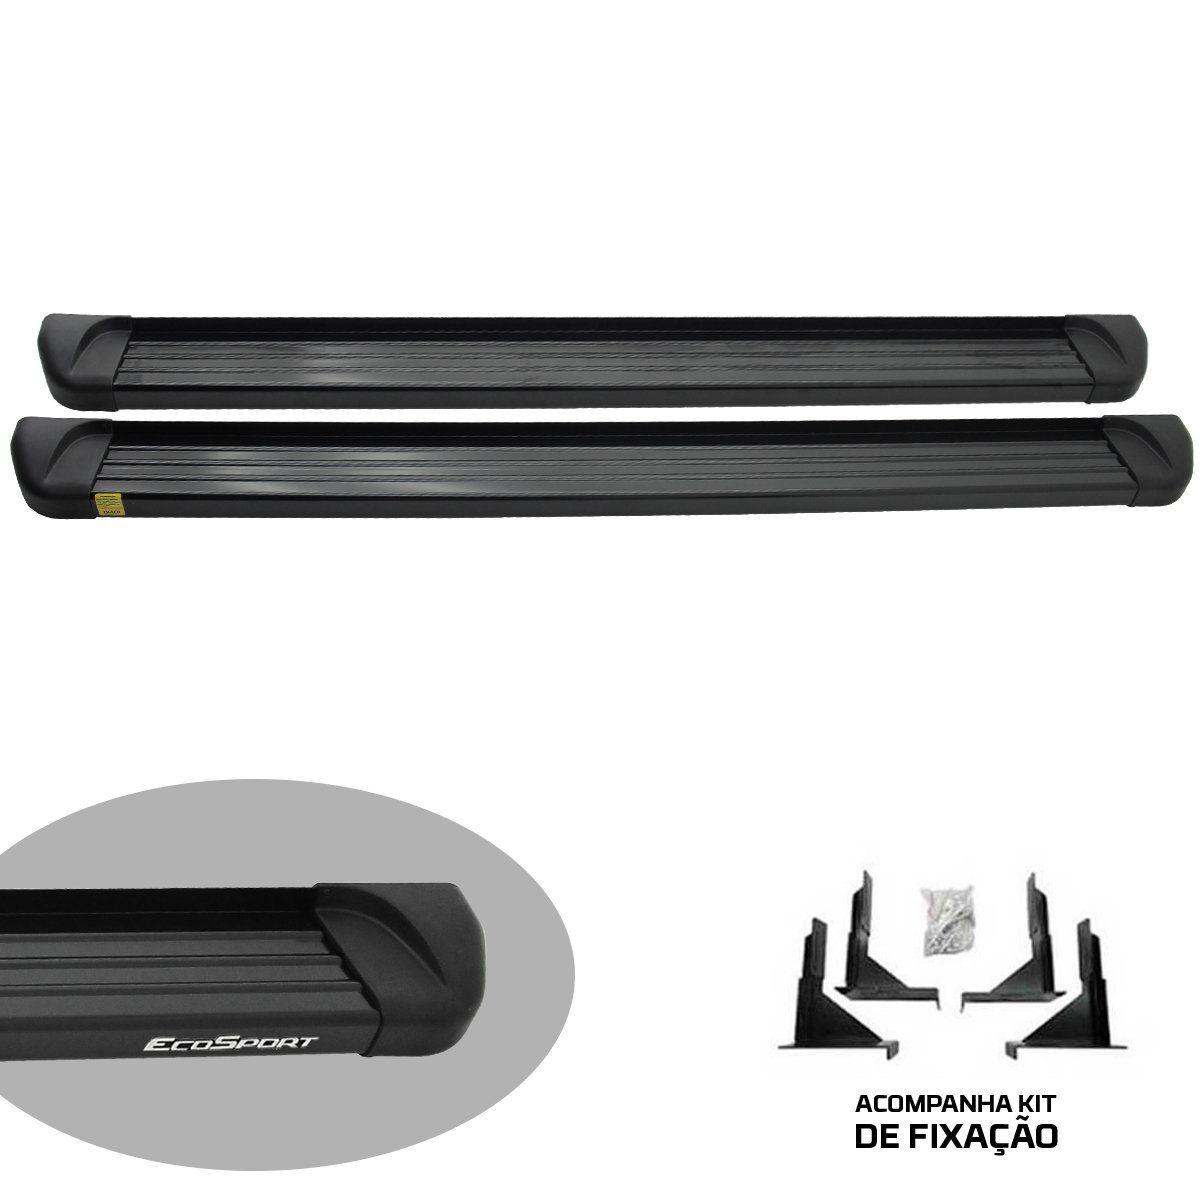 Estribo plataforma alumínio preto Ecosport 2013 a 2021